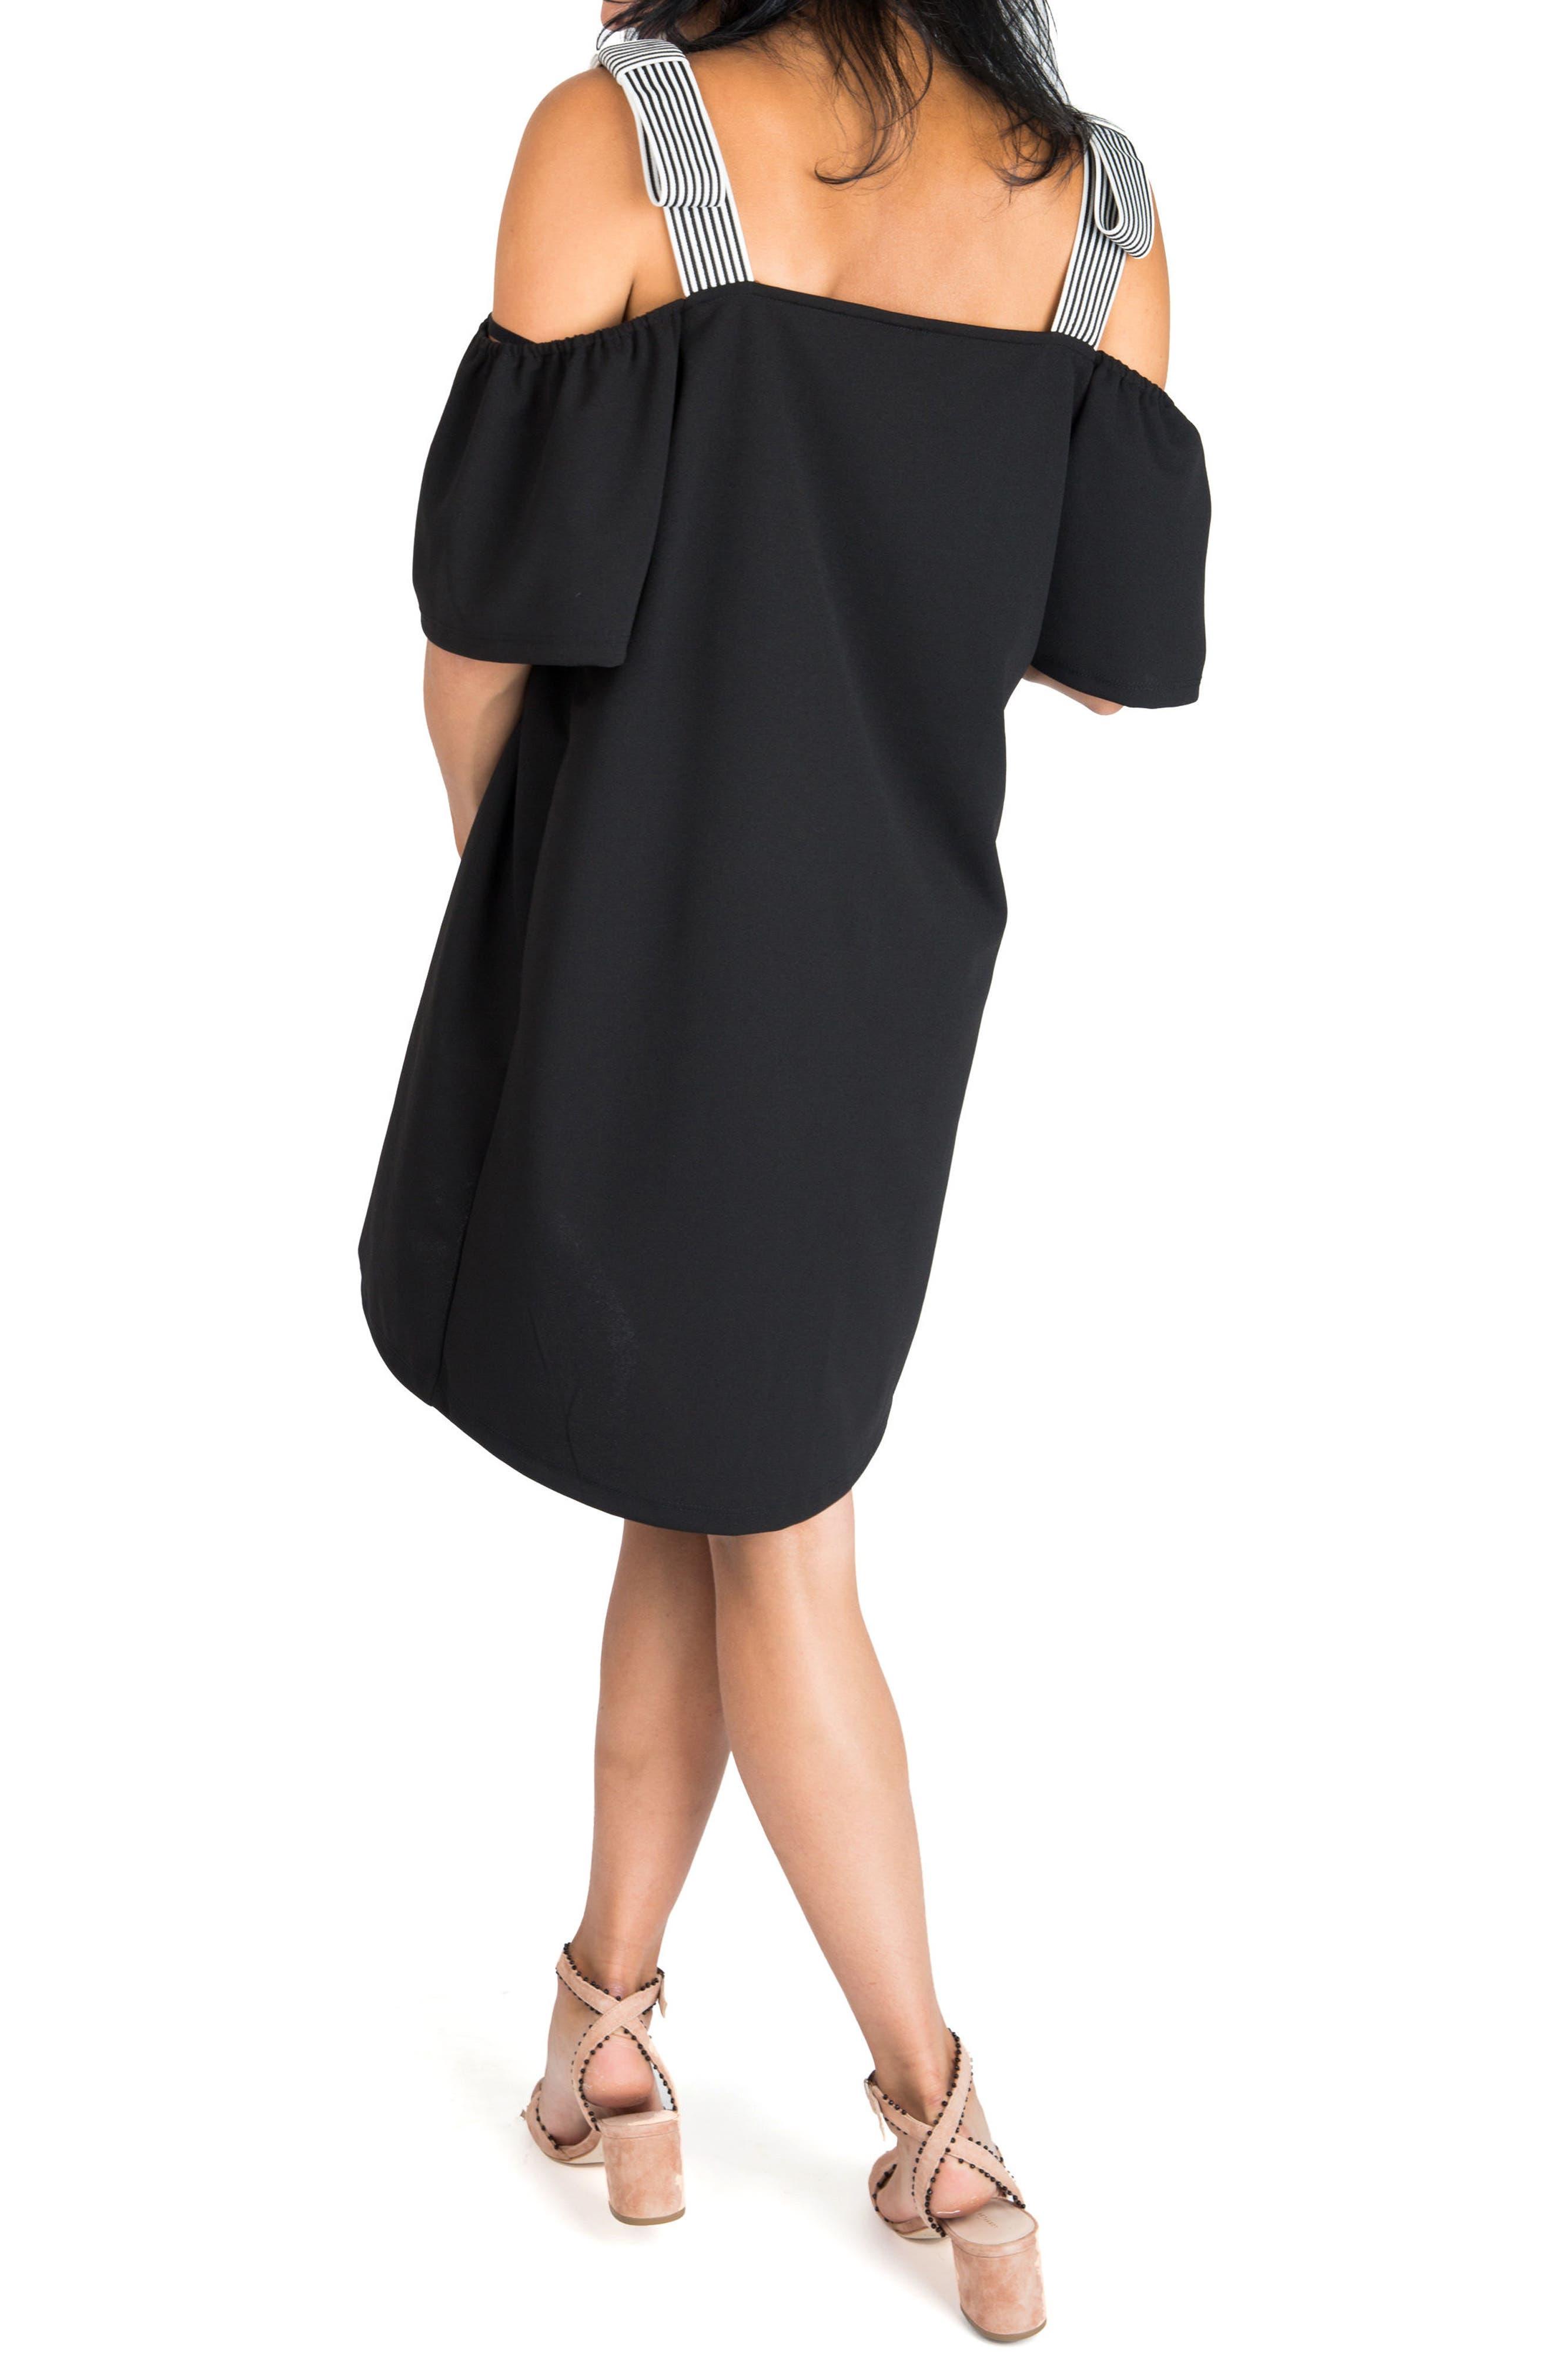 Millie Off the Shoulder Maternity Dress,                             Alternate thumbnail 2, color,                             Black